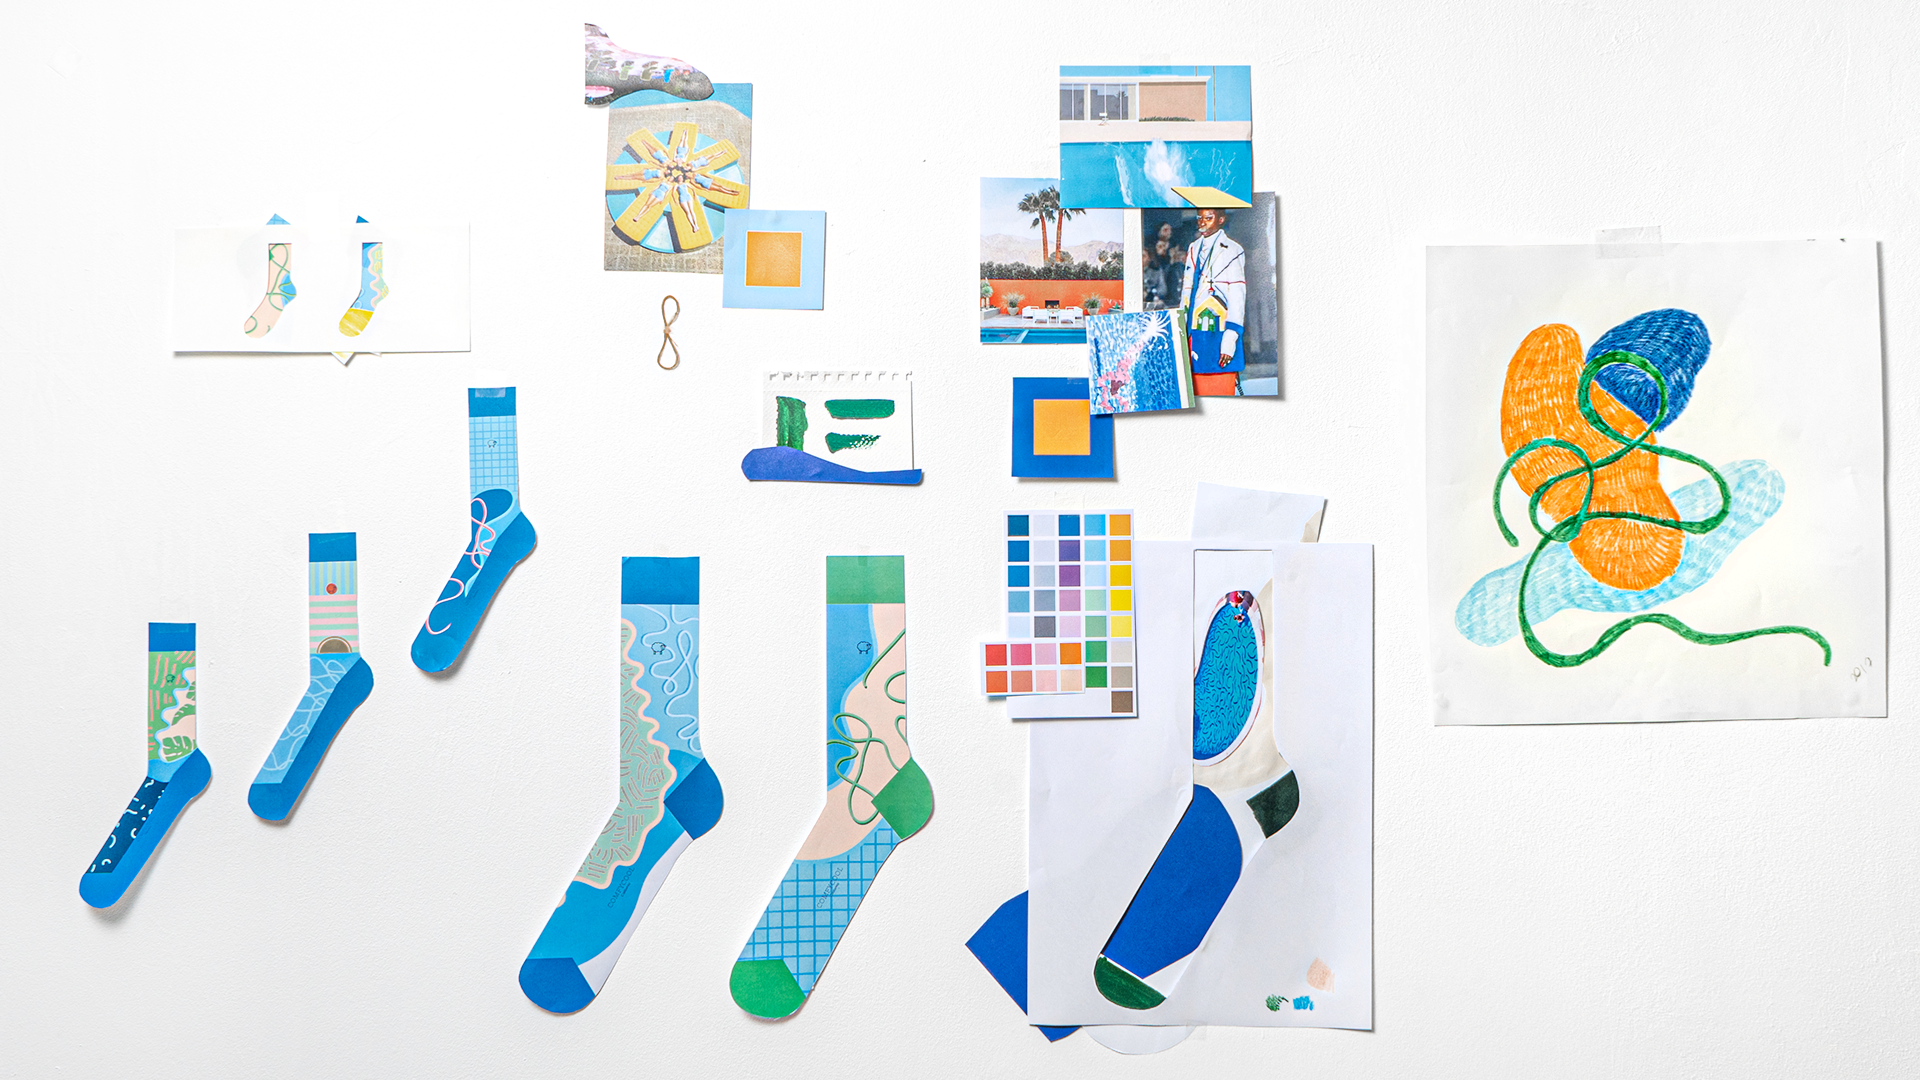 Socks Design Process